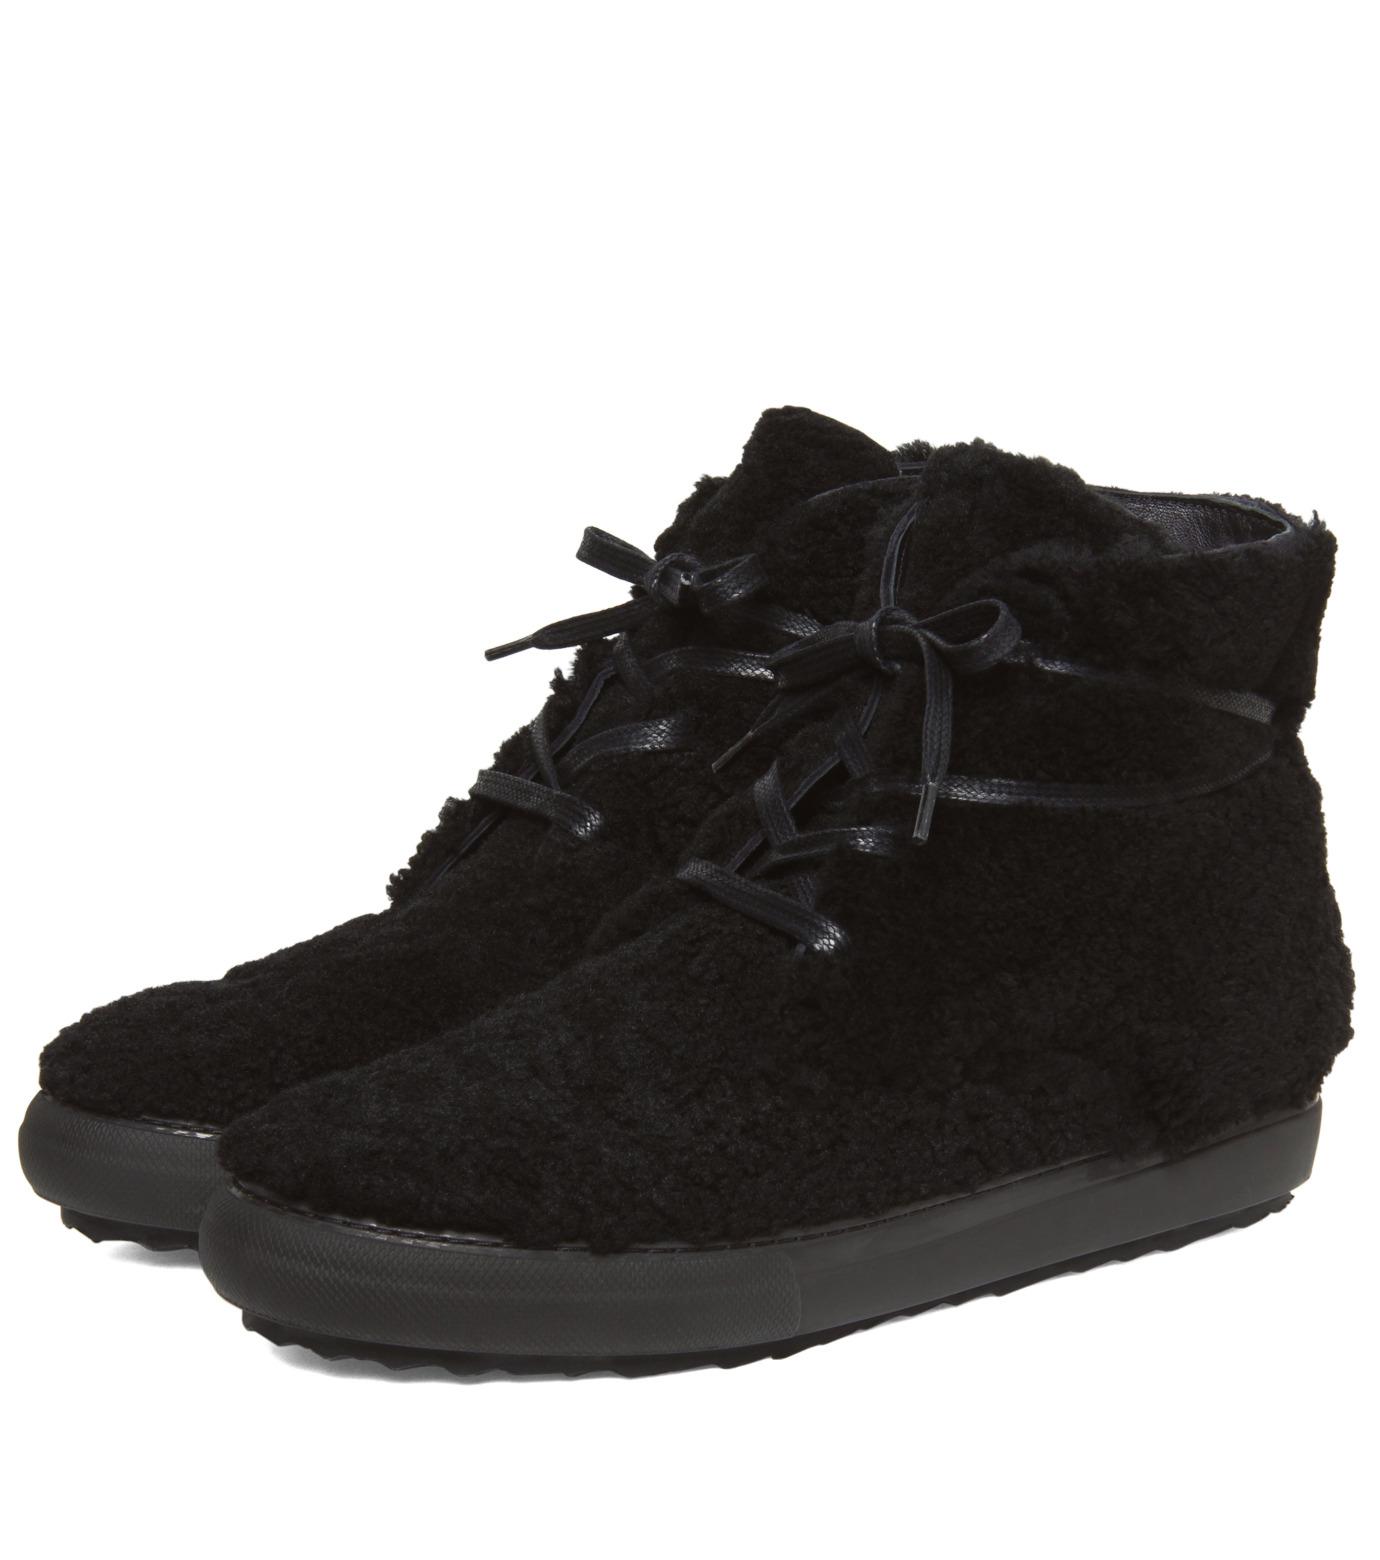 Pierre Hardy(ピエール アルディ)のMoutonChuckerBoots-BLACK(シューズ/shoes)-A4GX02SHEARL-13 拡大詳細画像4